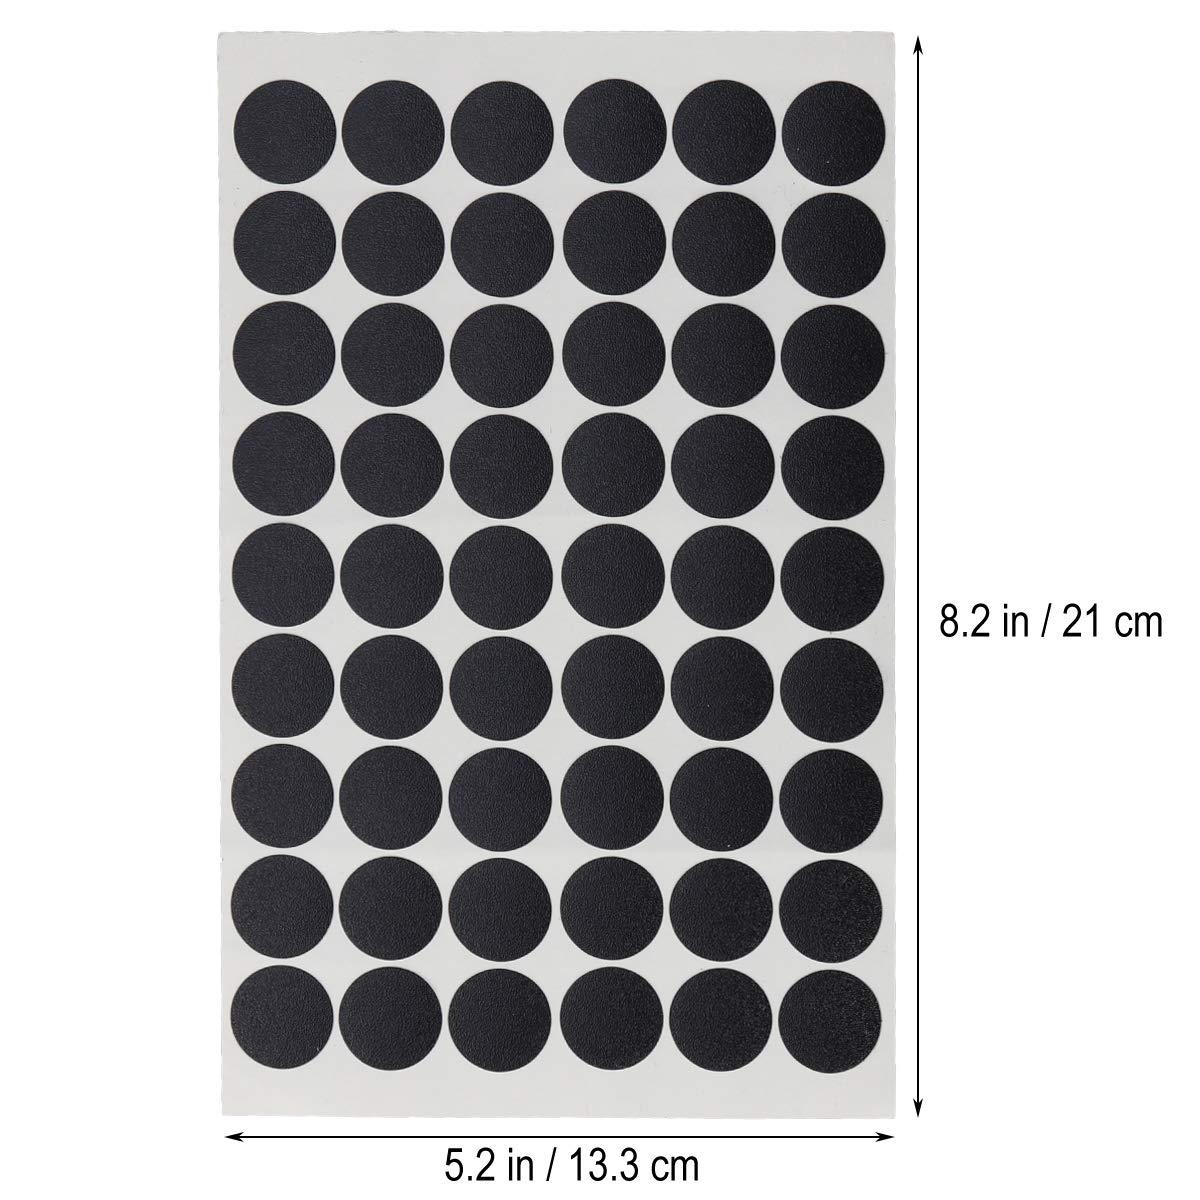 Yardwe 3Pcs Sheet PVC screw hole cover caps self-adhesive screw hole sticker for home office furniture 54pcs//sheet Polished Black